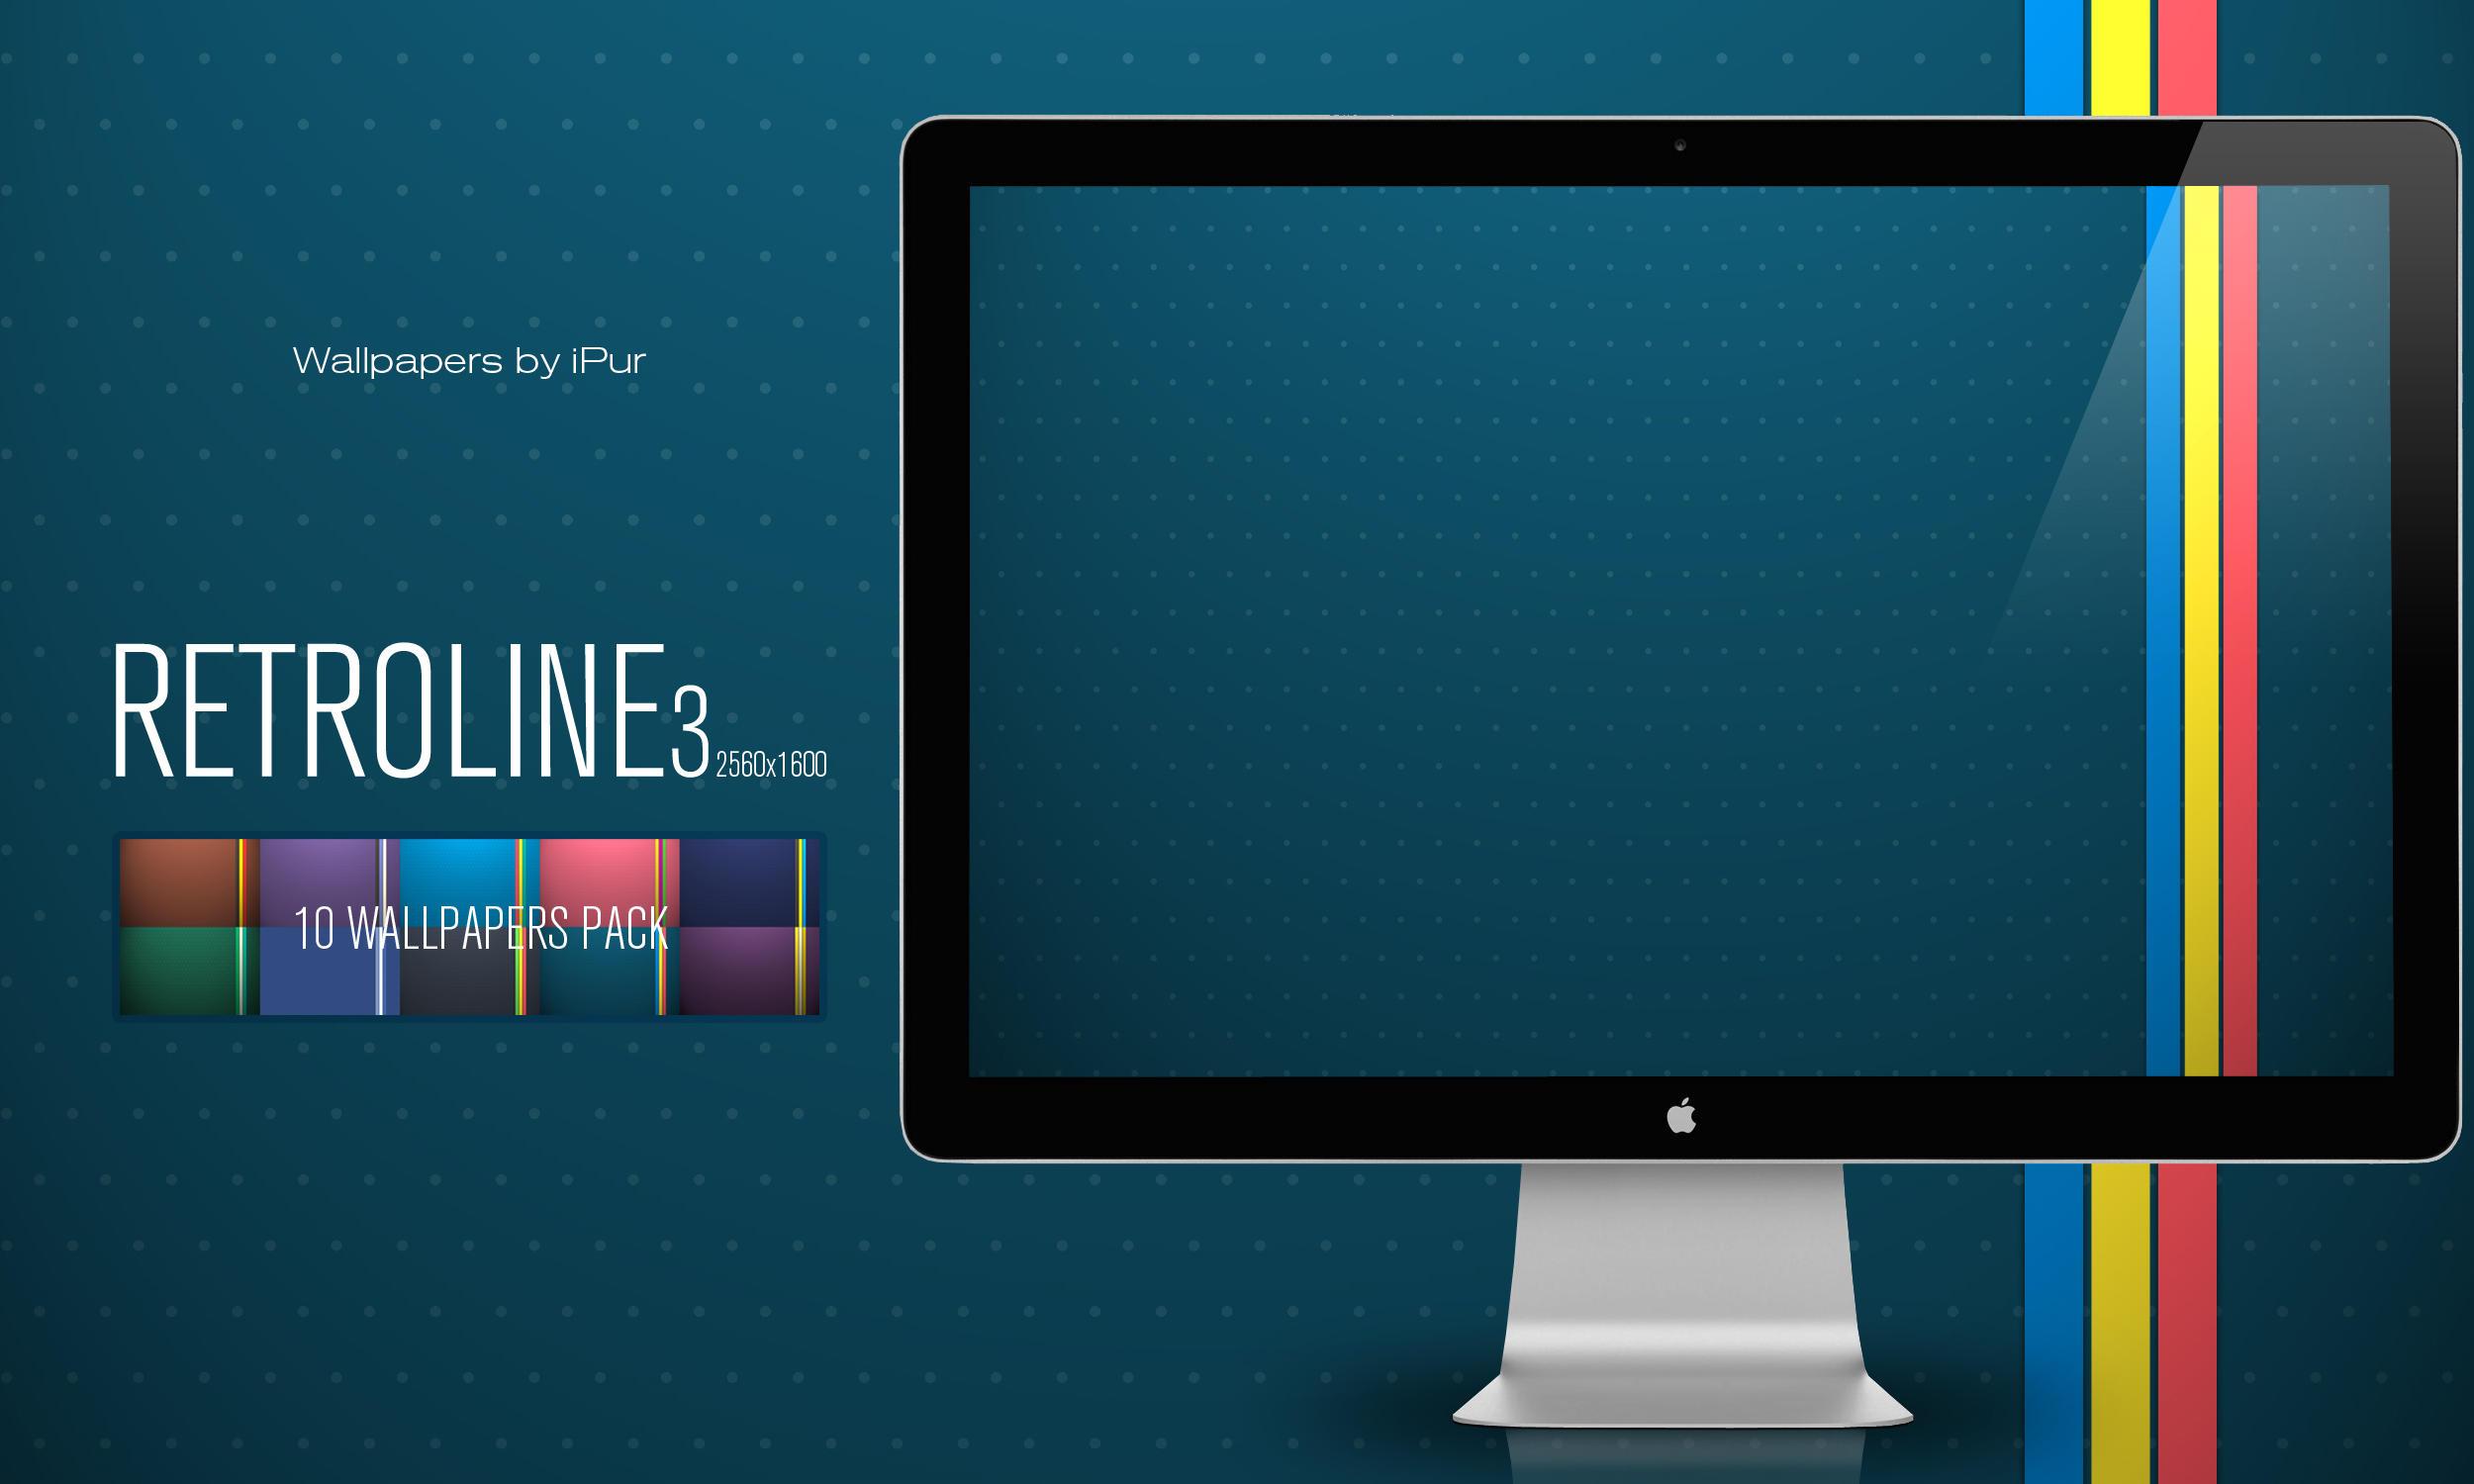 Retroline3 by iPur